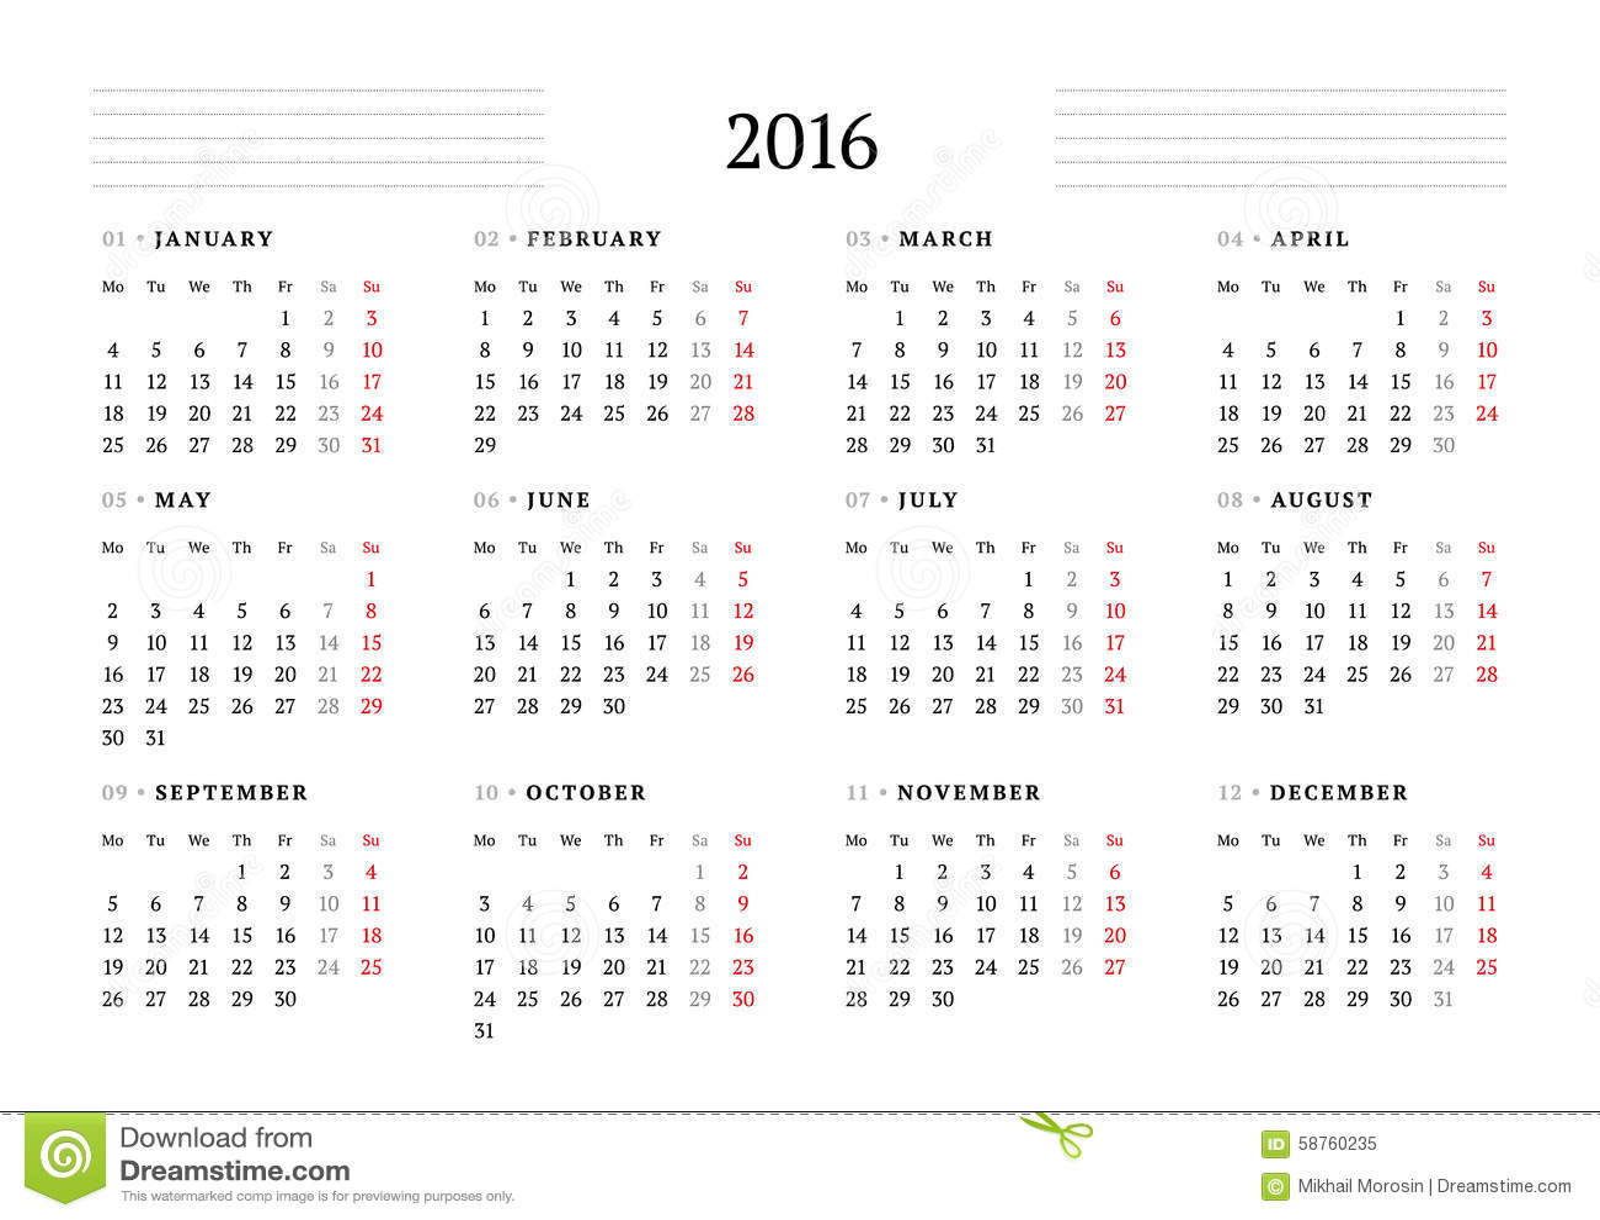 Simple Calendar For 2016 12 Months Week Starts Monday